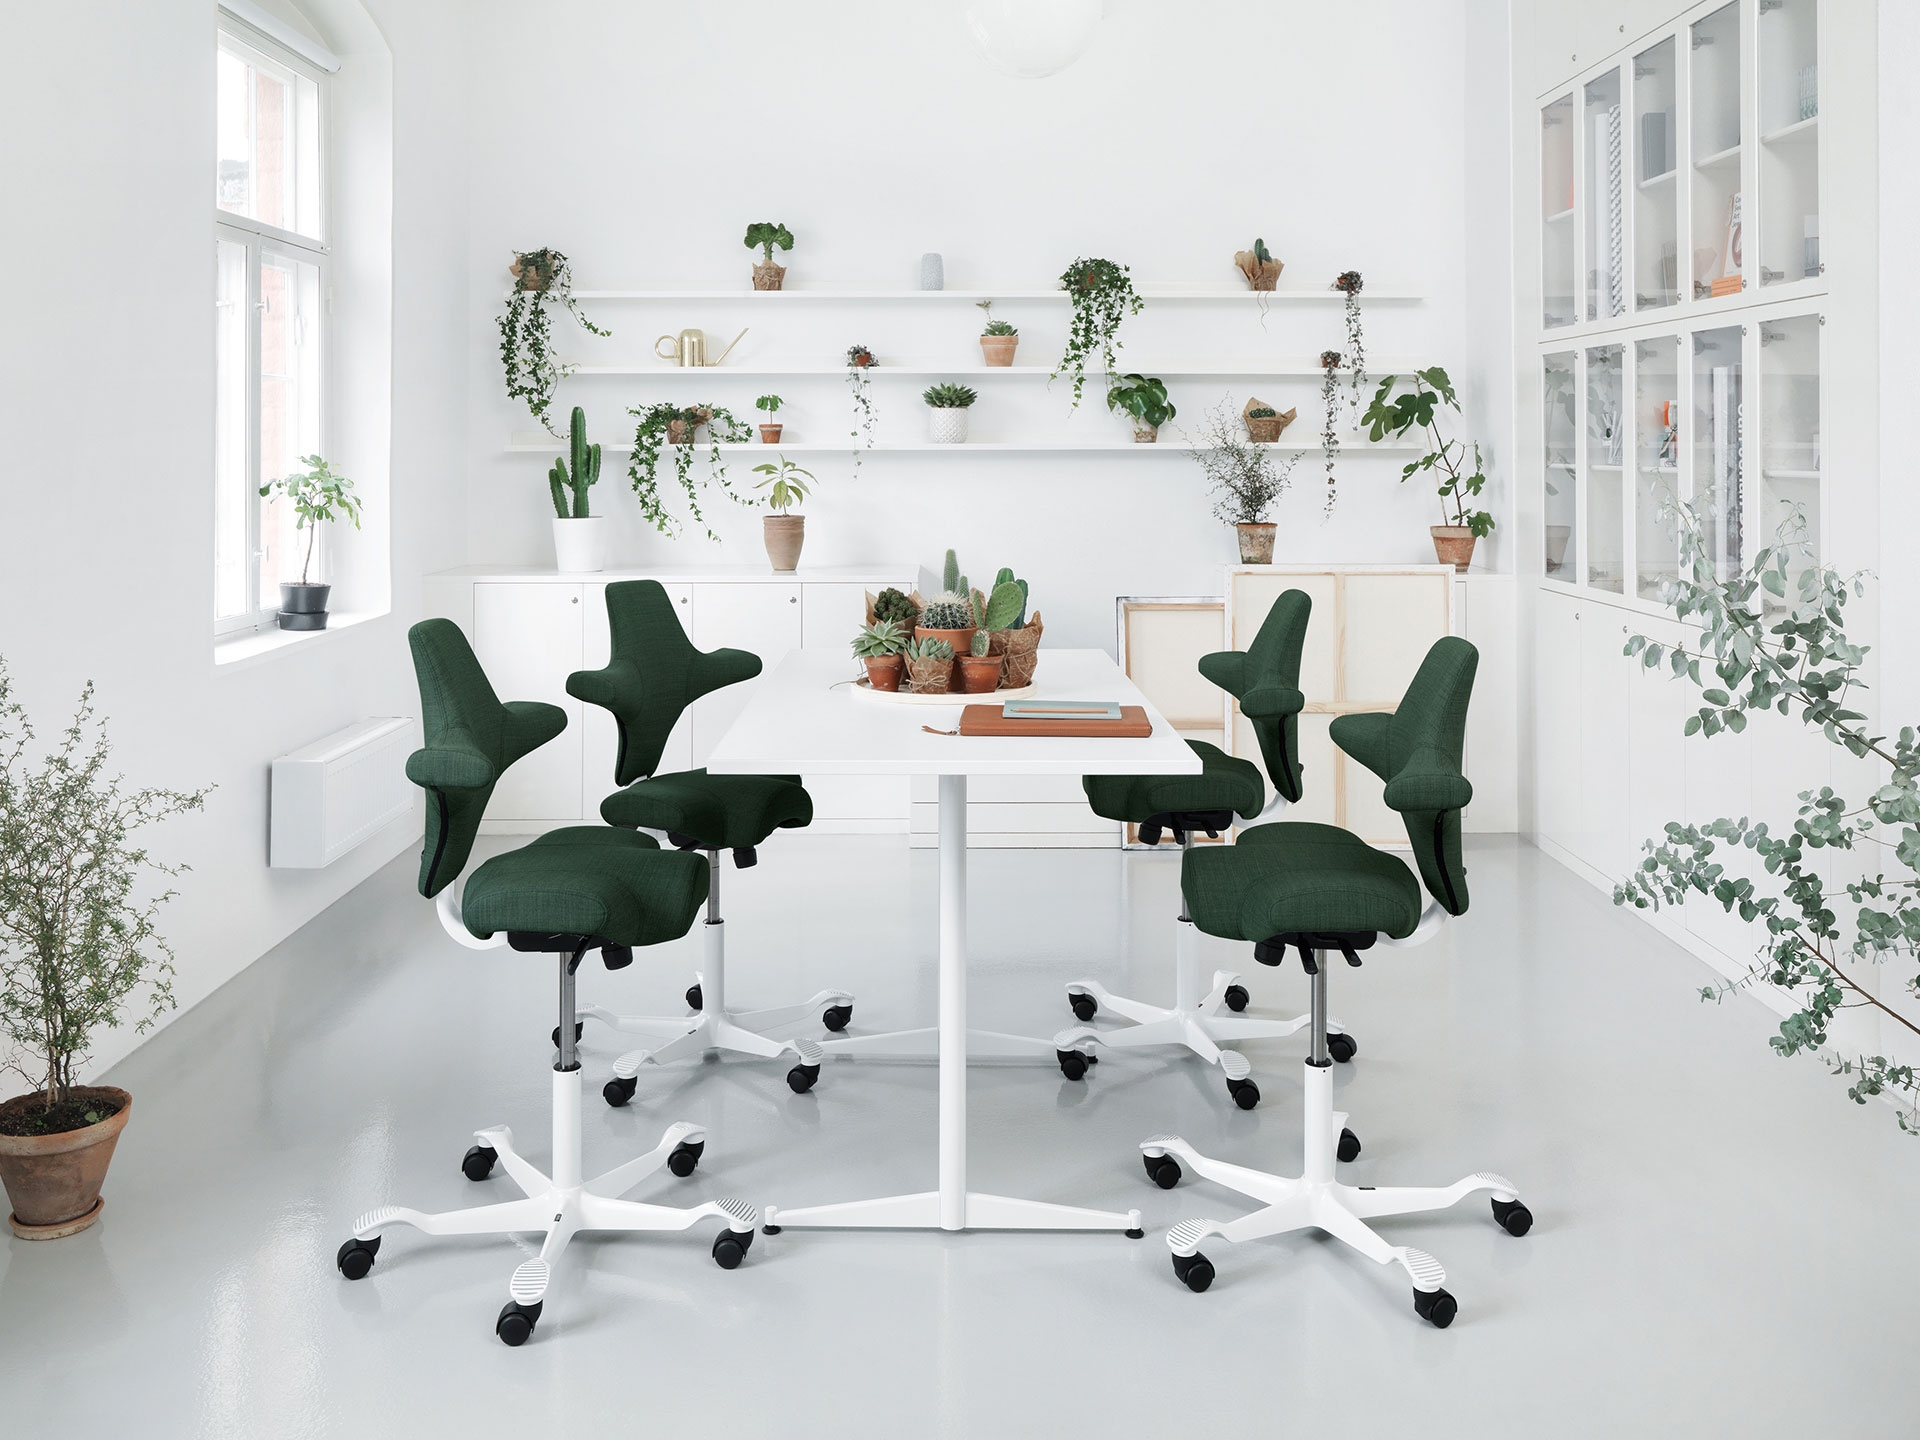 HAG_Capisco ilgtspējīgas mēbeles